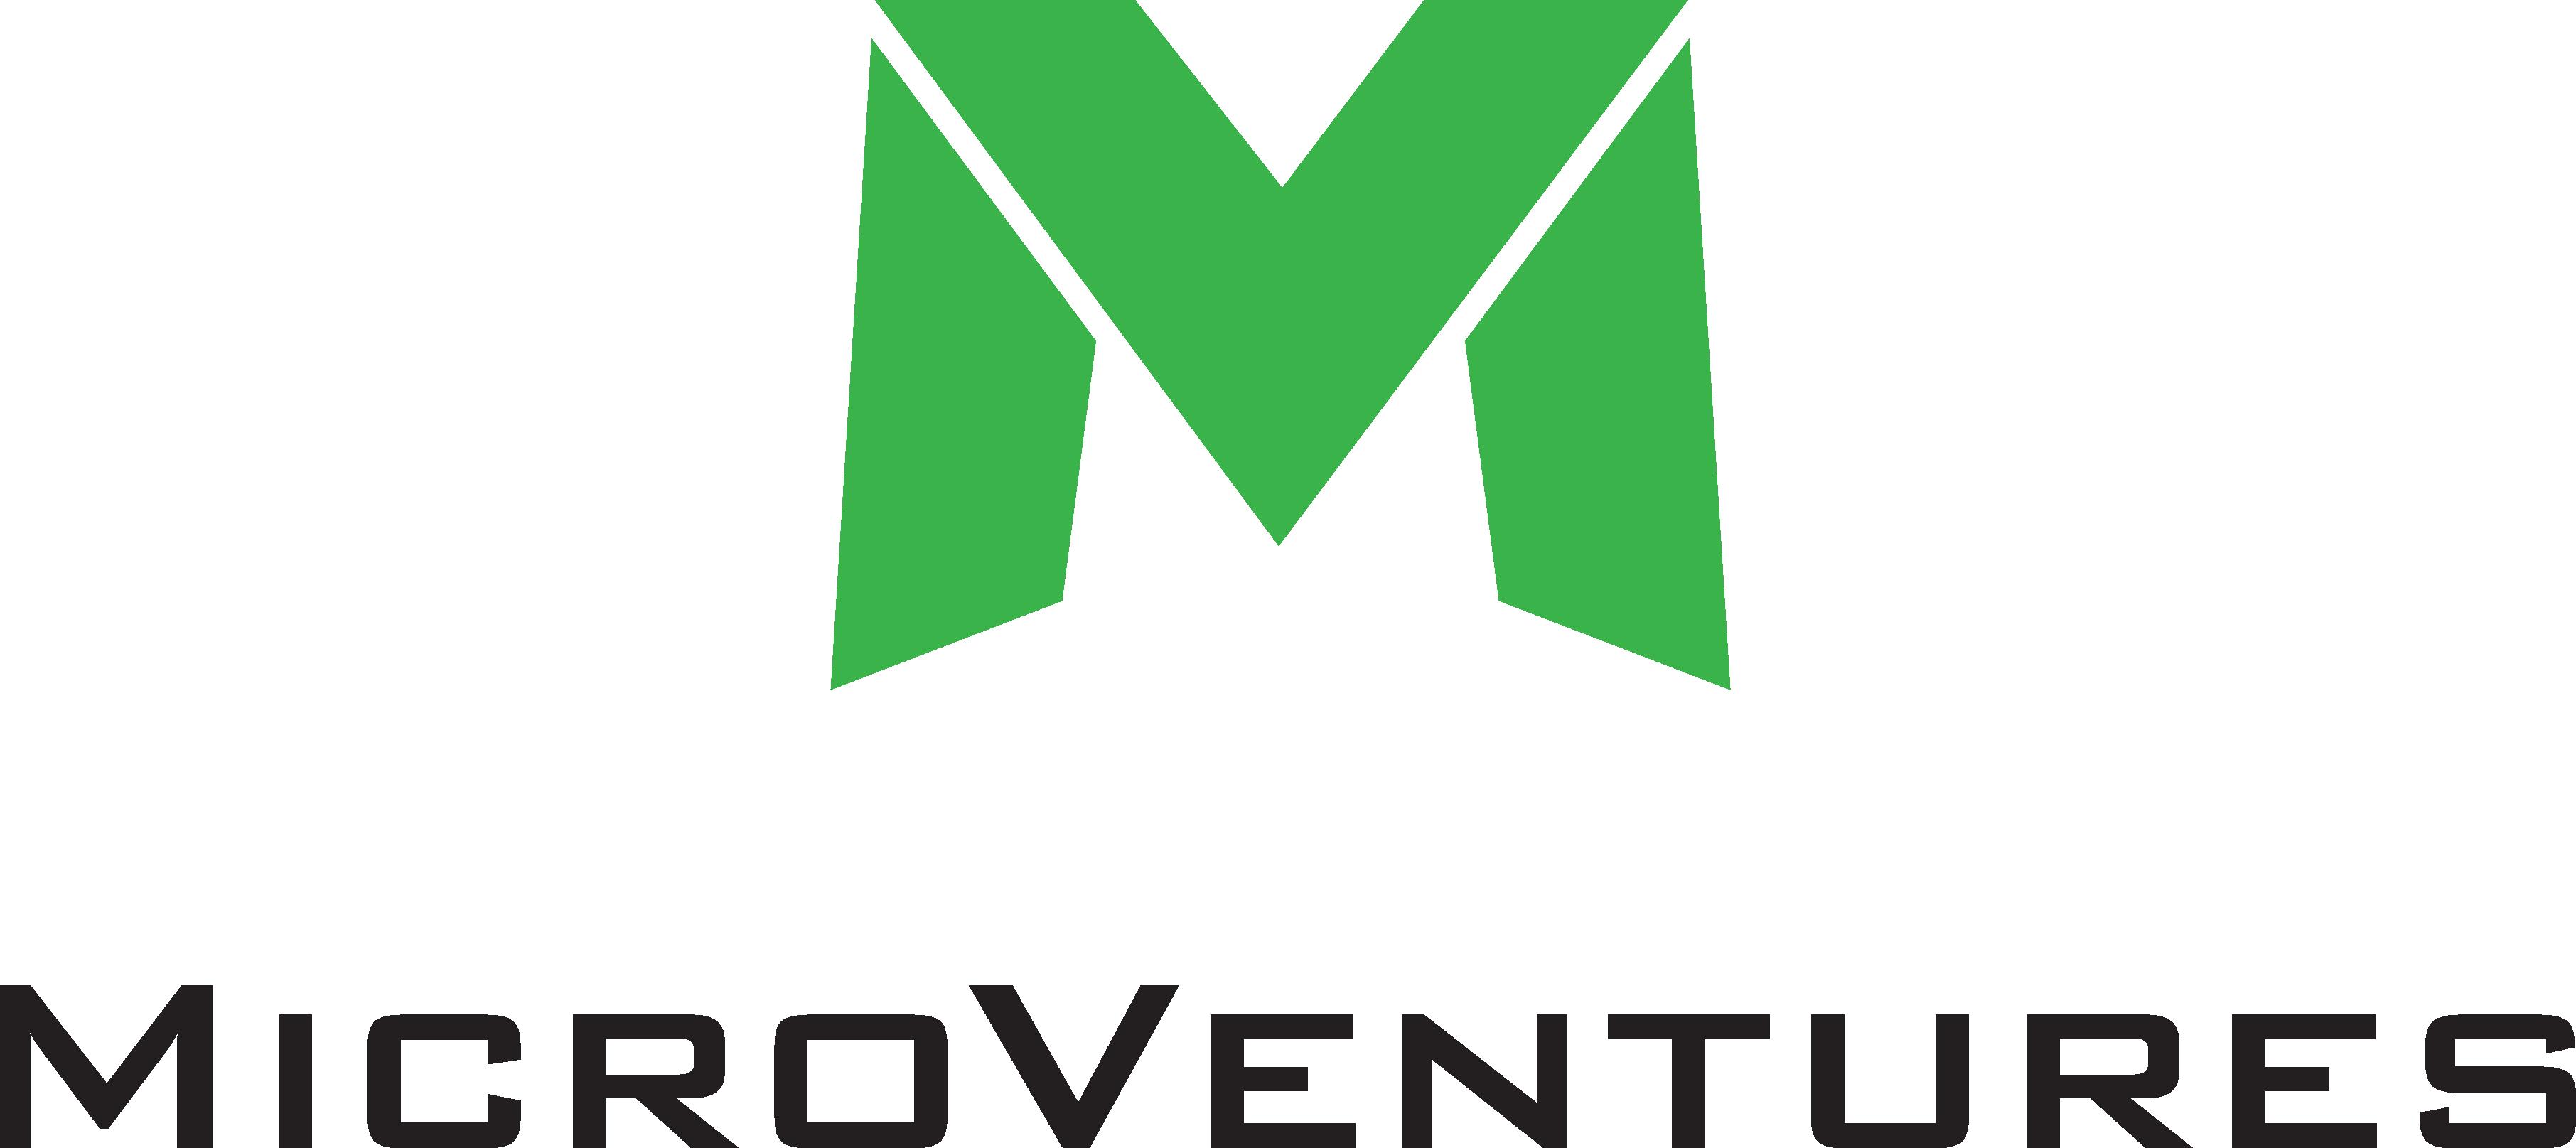 MicroVentures Marketplace company logo